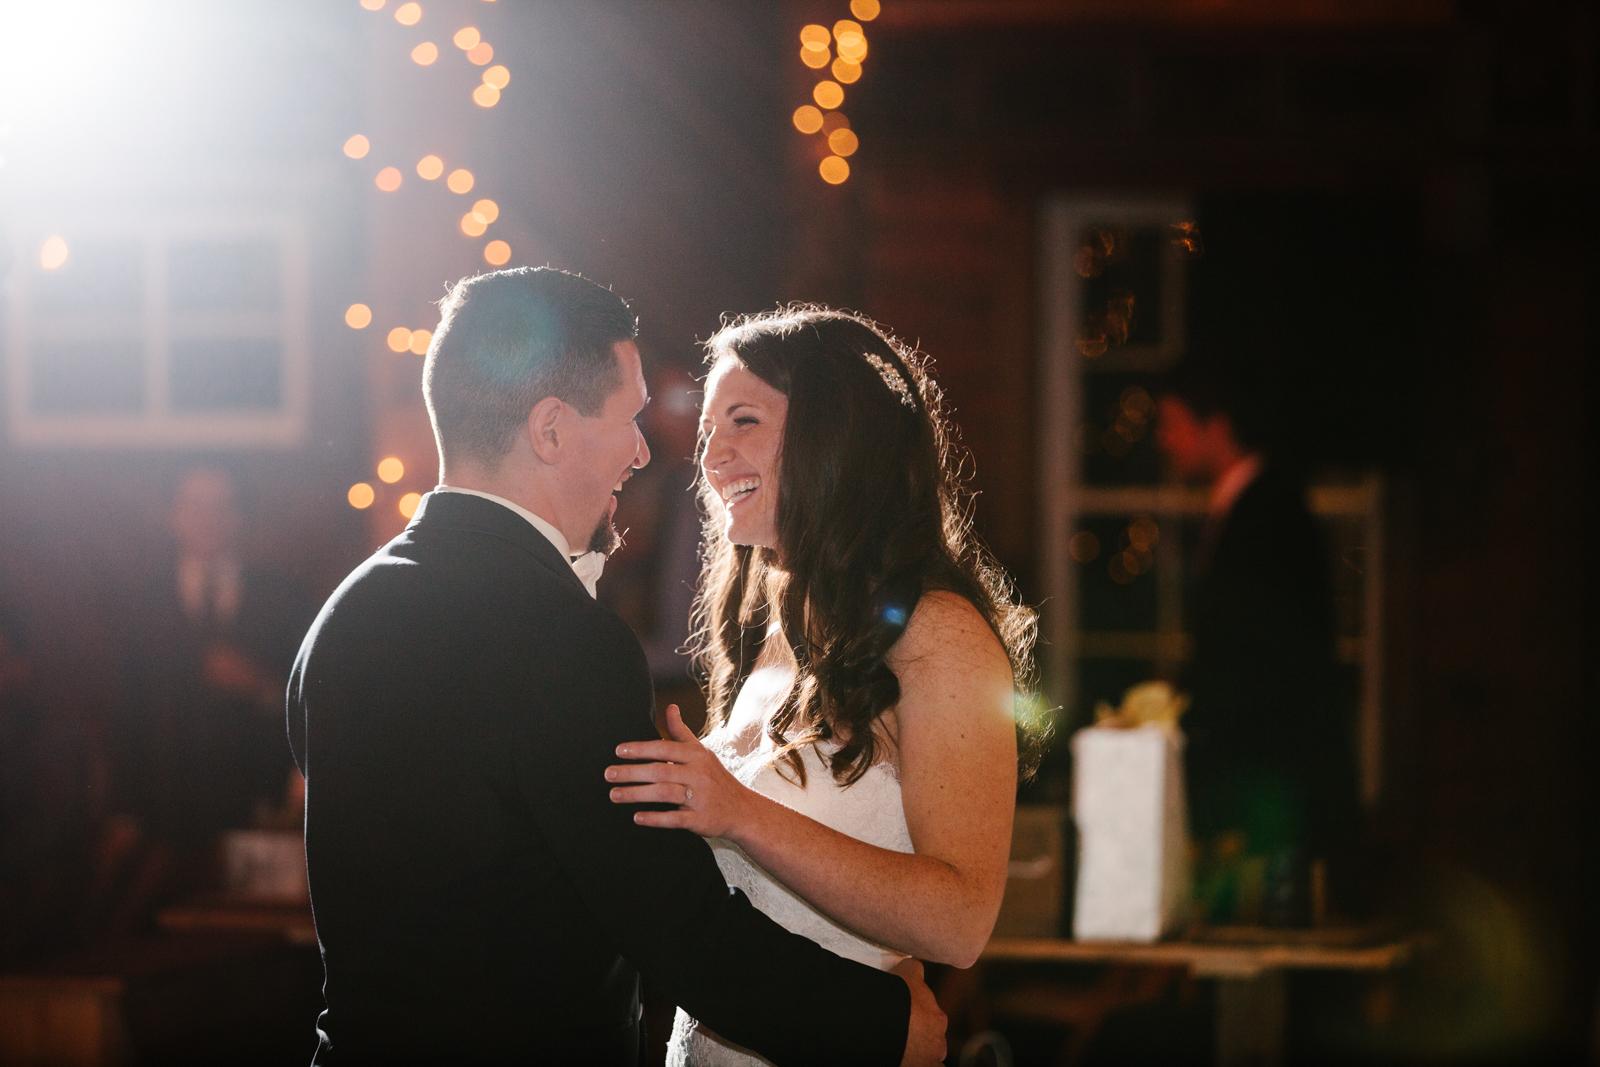 Glimmerstone-Mansion-Vermont-Wedding-Photography-Amanda-Morgan-127.jpg